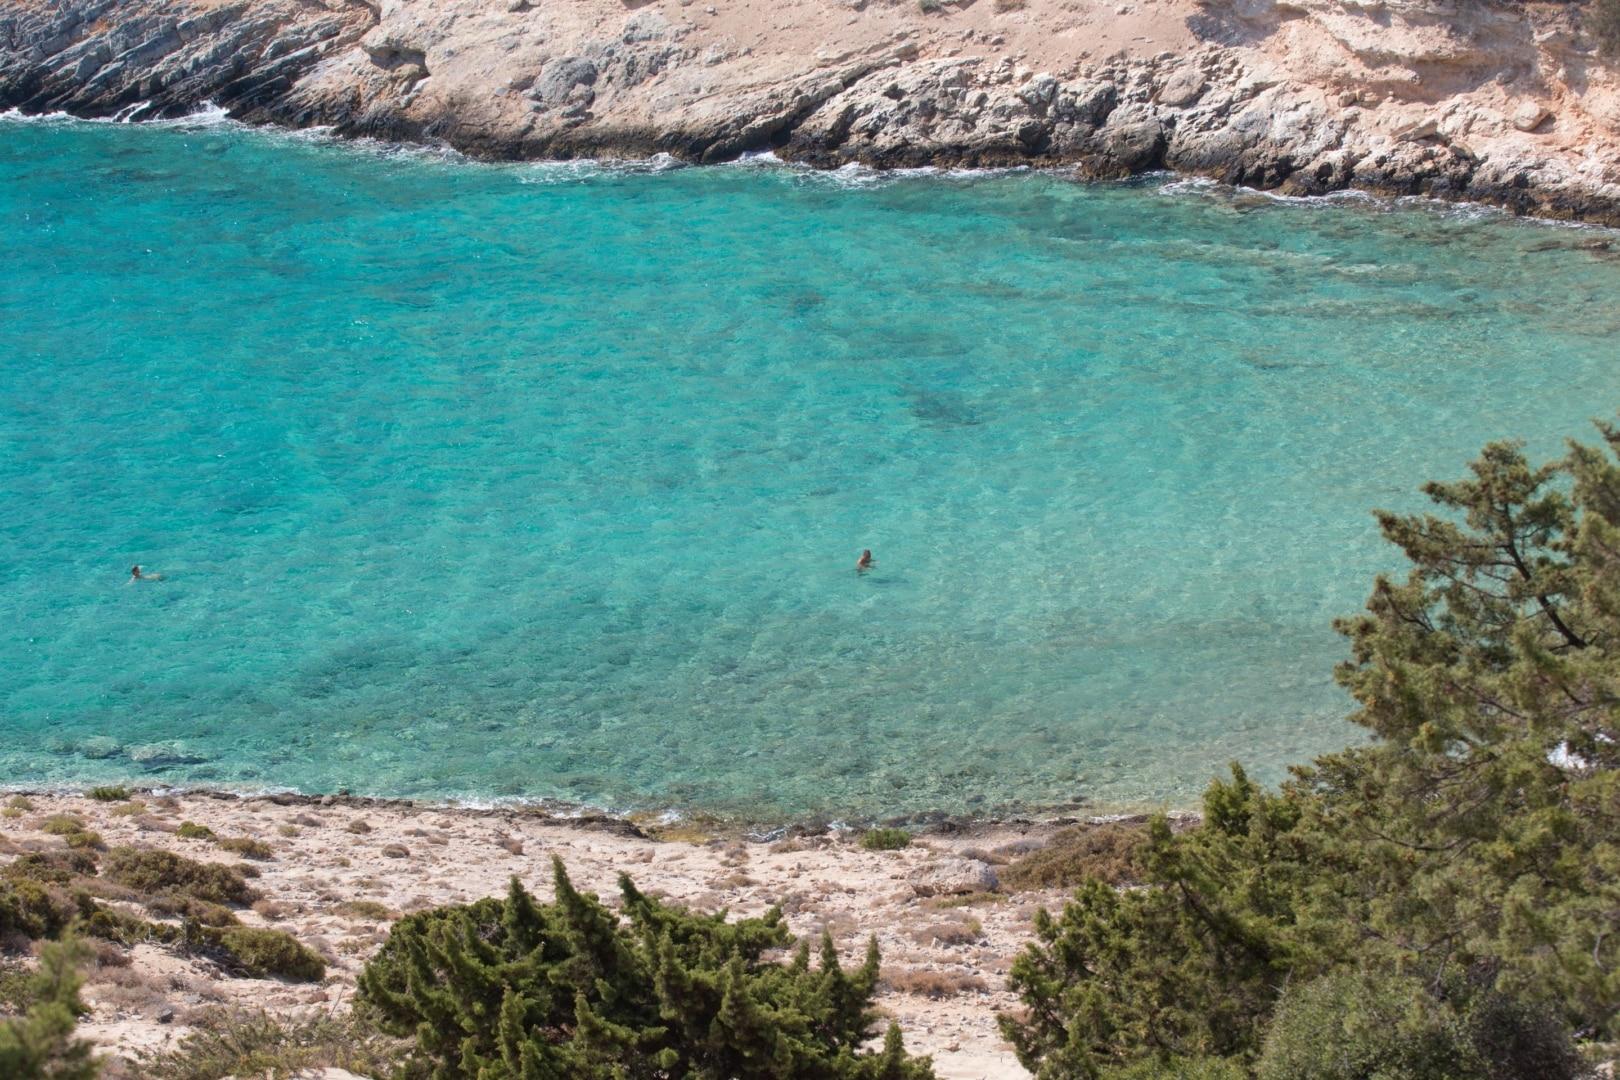 Cyclades - Schinoussa